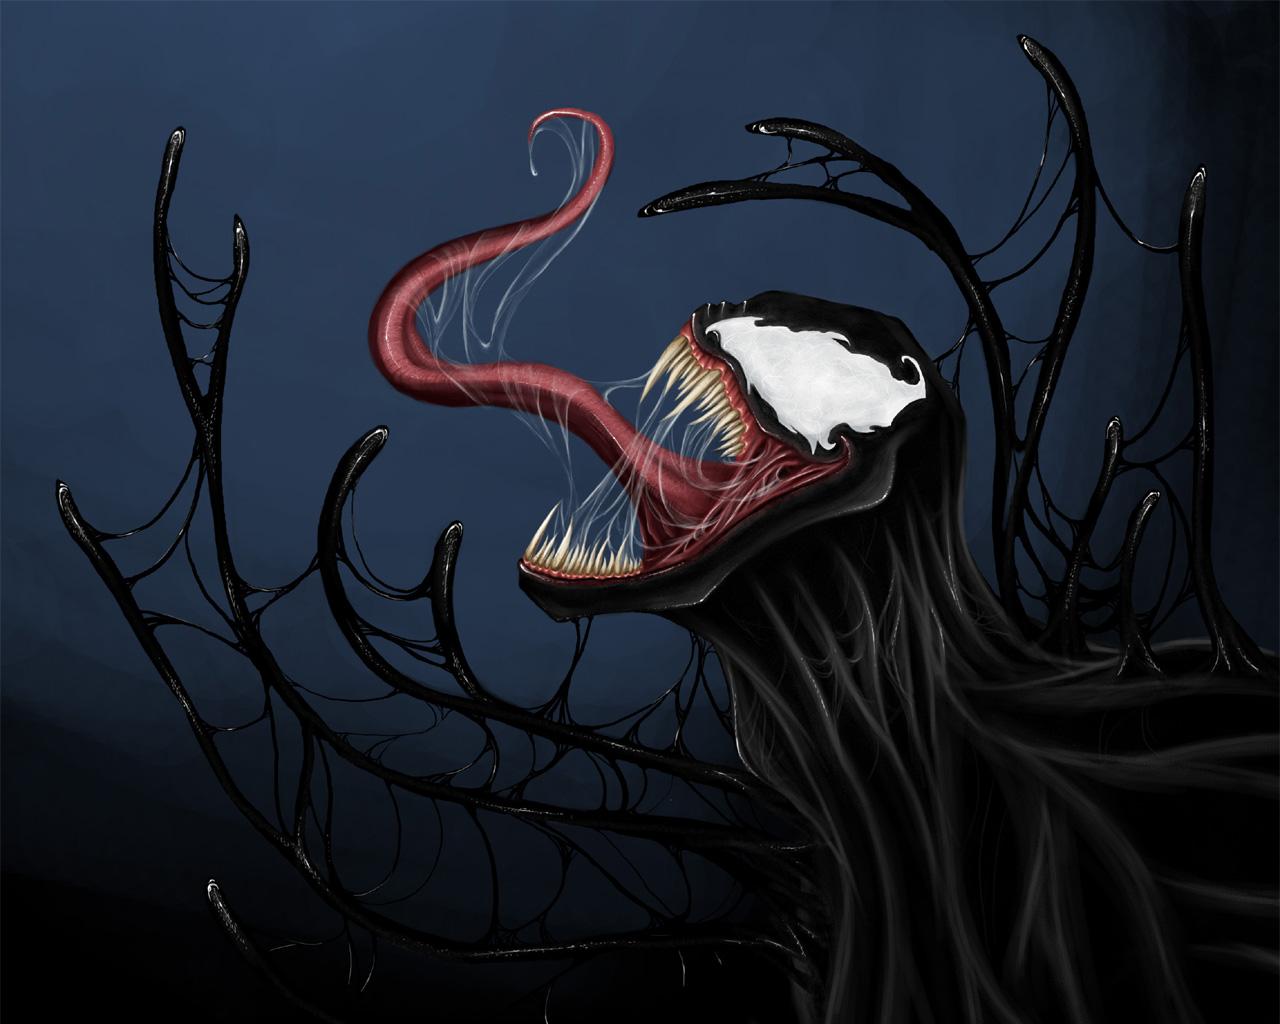 Wallpaper HD Spiderman Venom Carnage taringanet 1280x1024